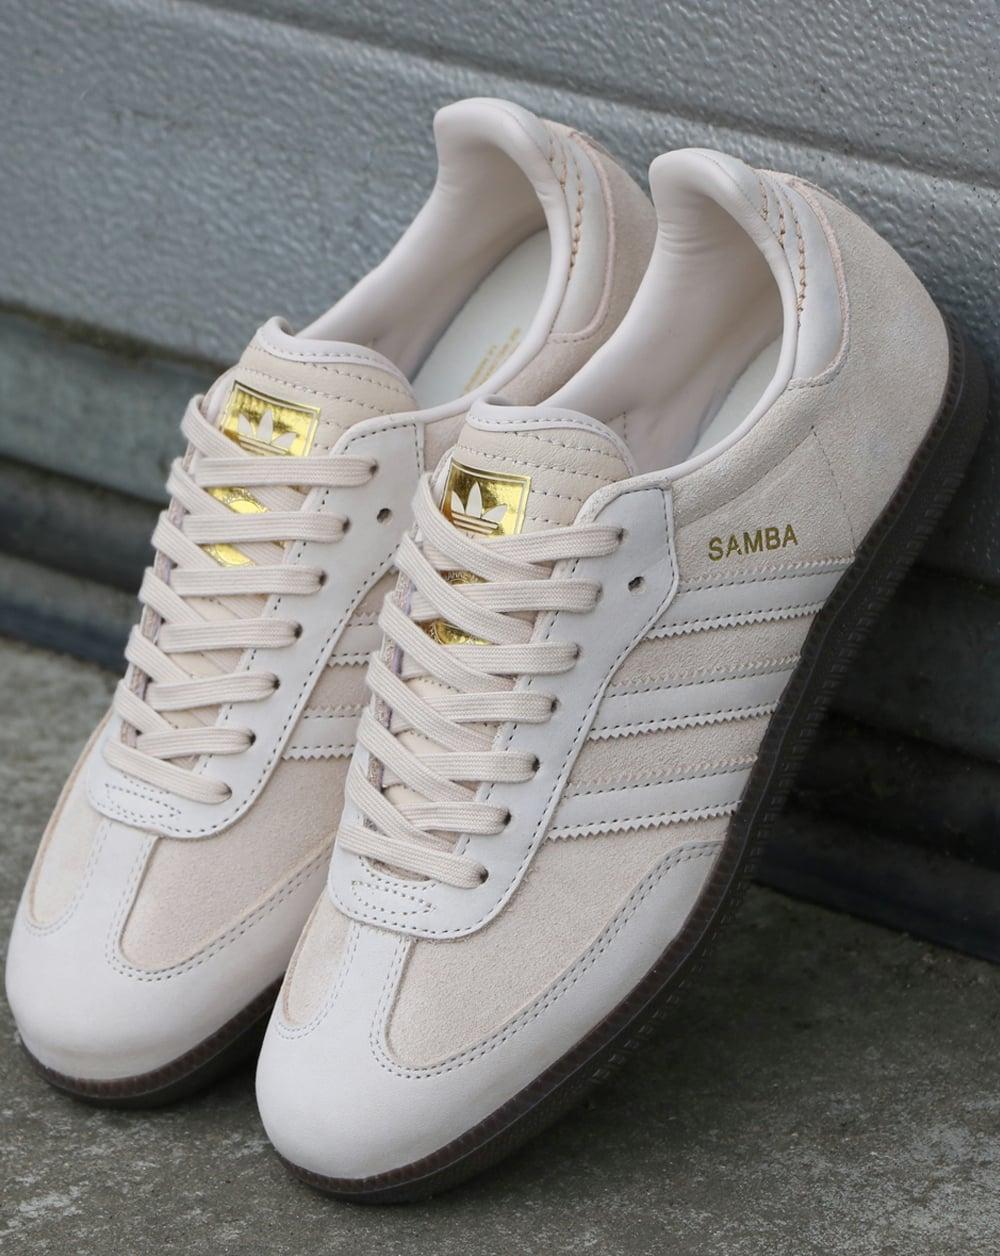 size 40 9ef44 ef14e adidas Trainers Adidas Samba Trainers Vintage Stone